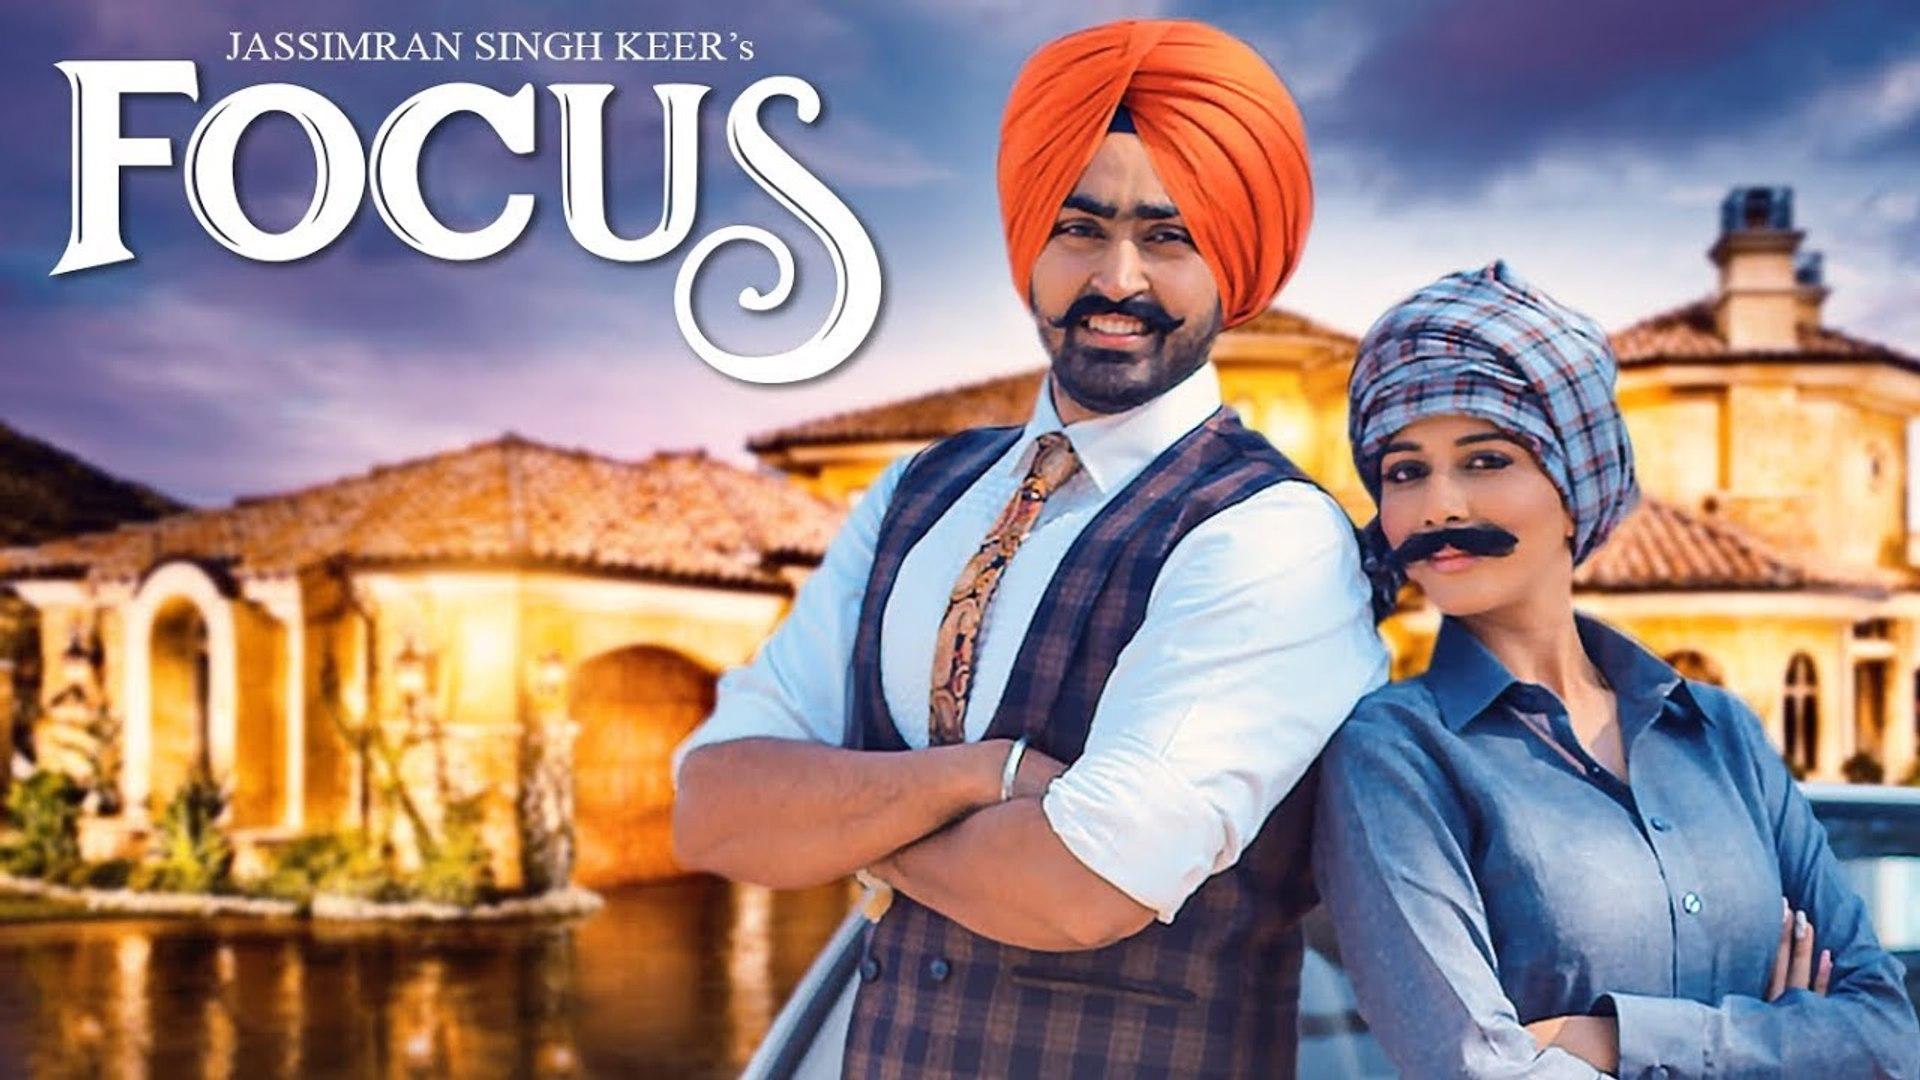 Jassimran Singh Keer Focus Feat.Mishika Chourasia Mista Baaz Latest Punjabi Songs 2017